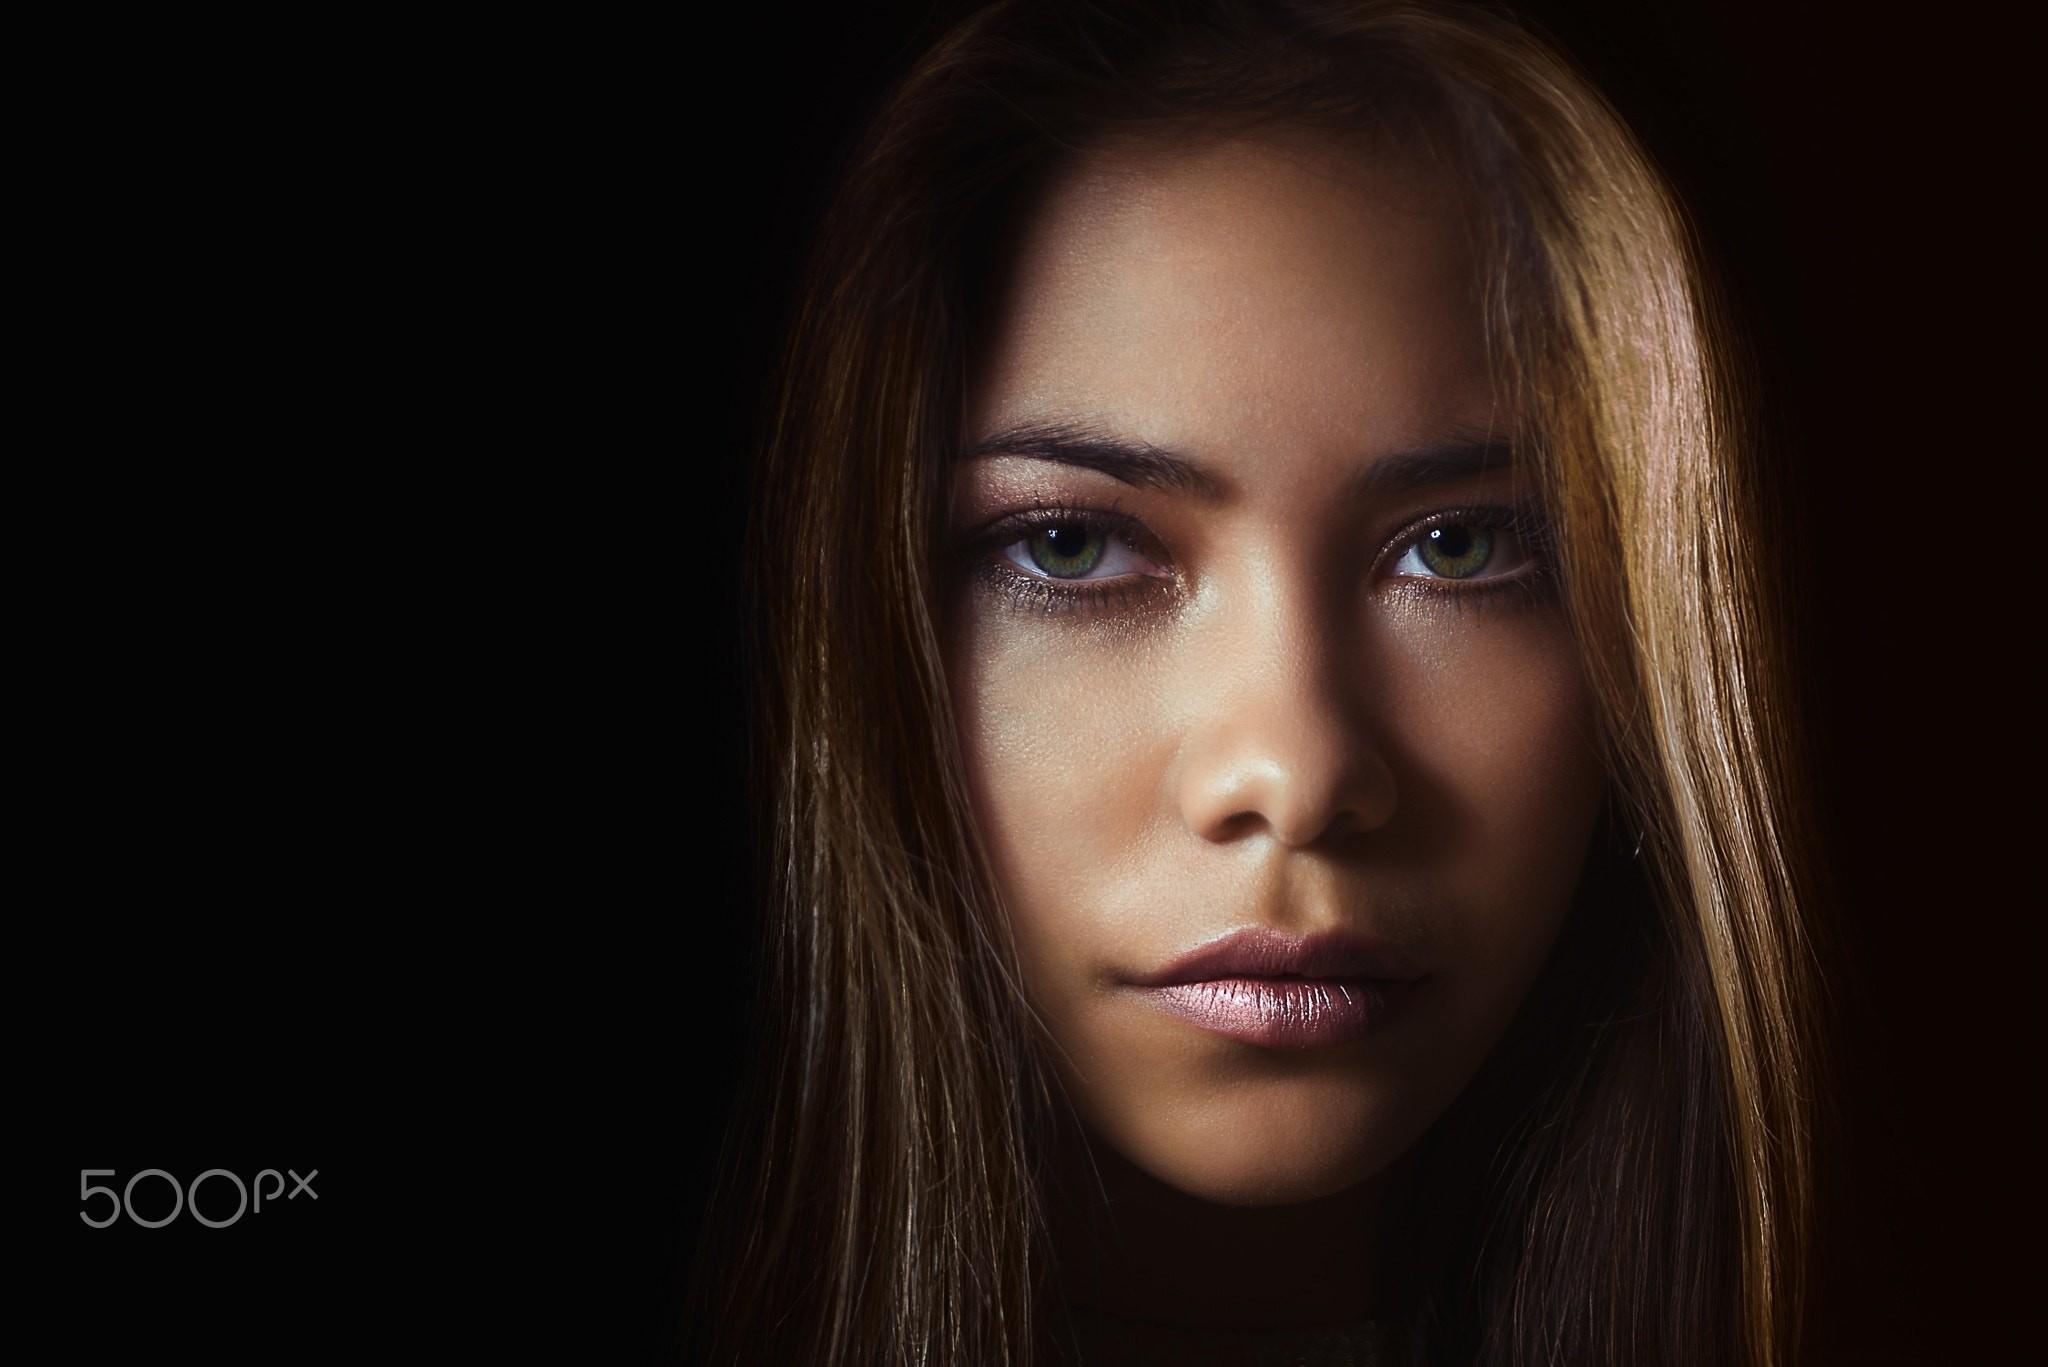 Wallpaper Face Women Simple Background Long Hair: Wallpaper : Face, Women, 500px, Model, Simple Background